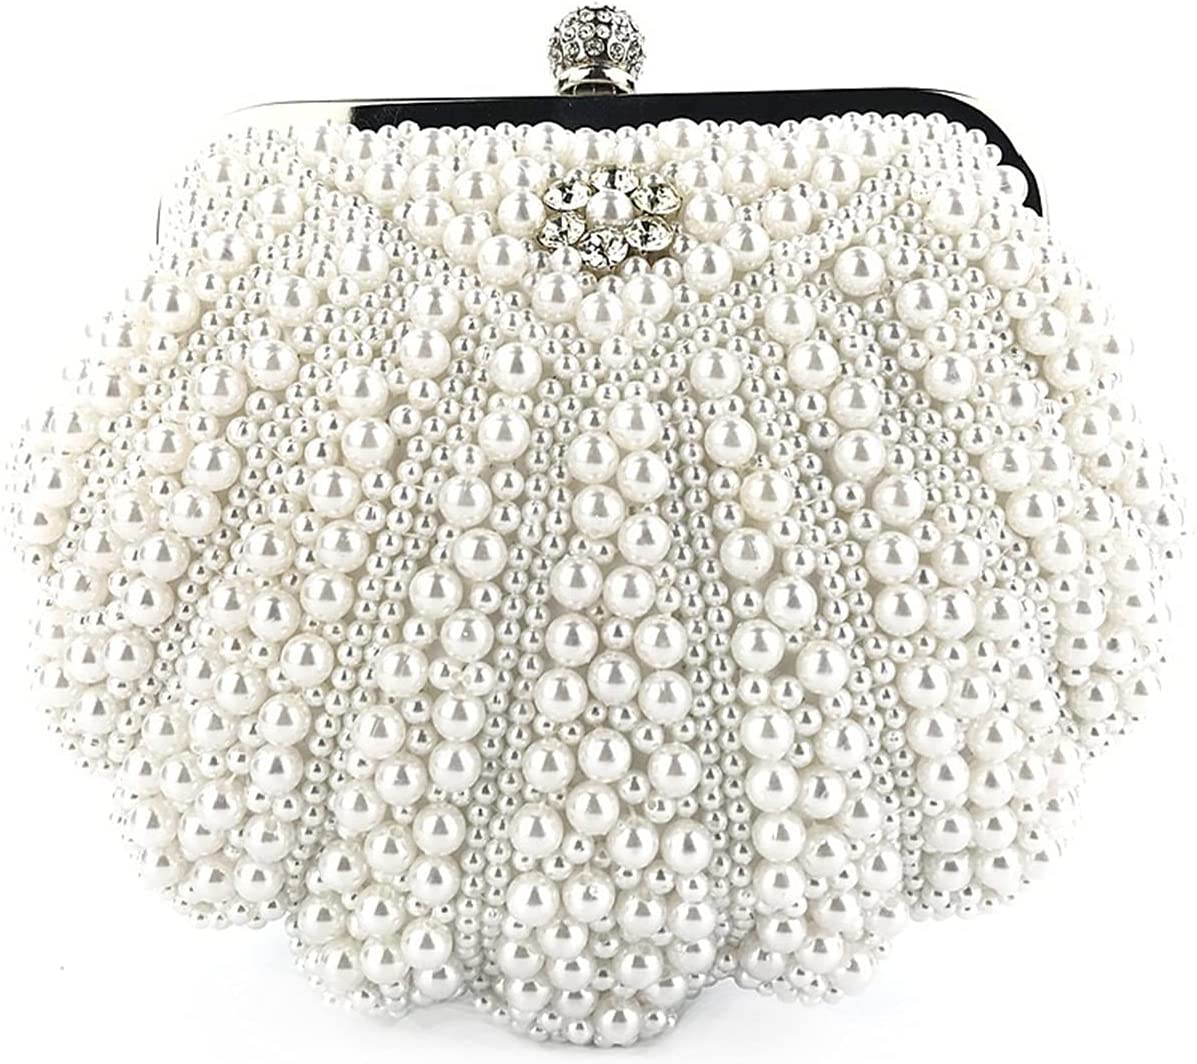 MKOIJN Clutch Evening Bag Evening Wedding Dinner Prom Clutch Bag for Women (Color : White)